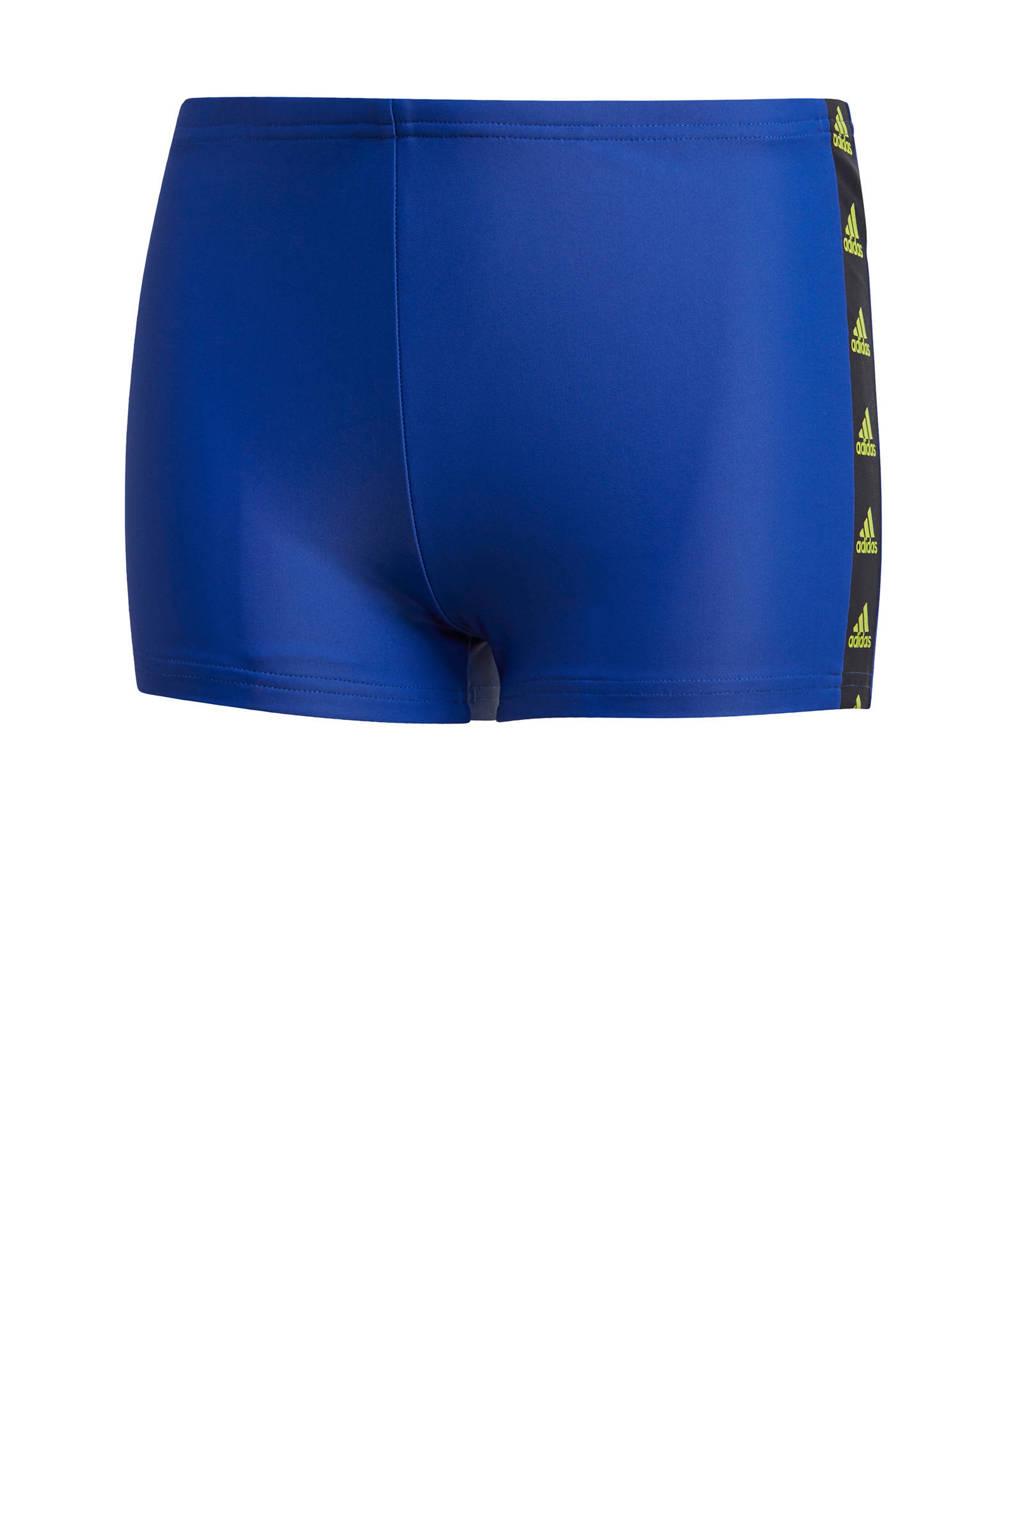 adidas Performance zwemboxer blauw, Blauw